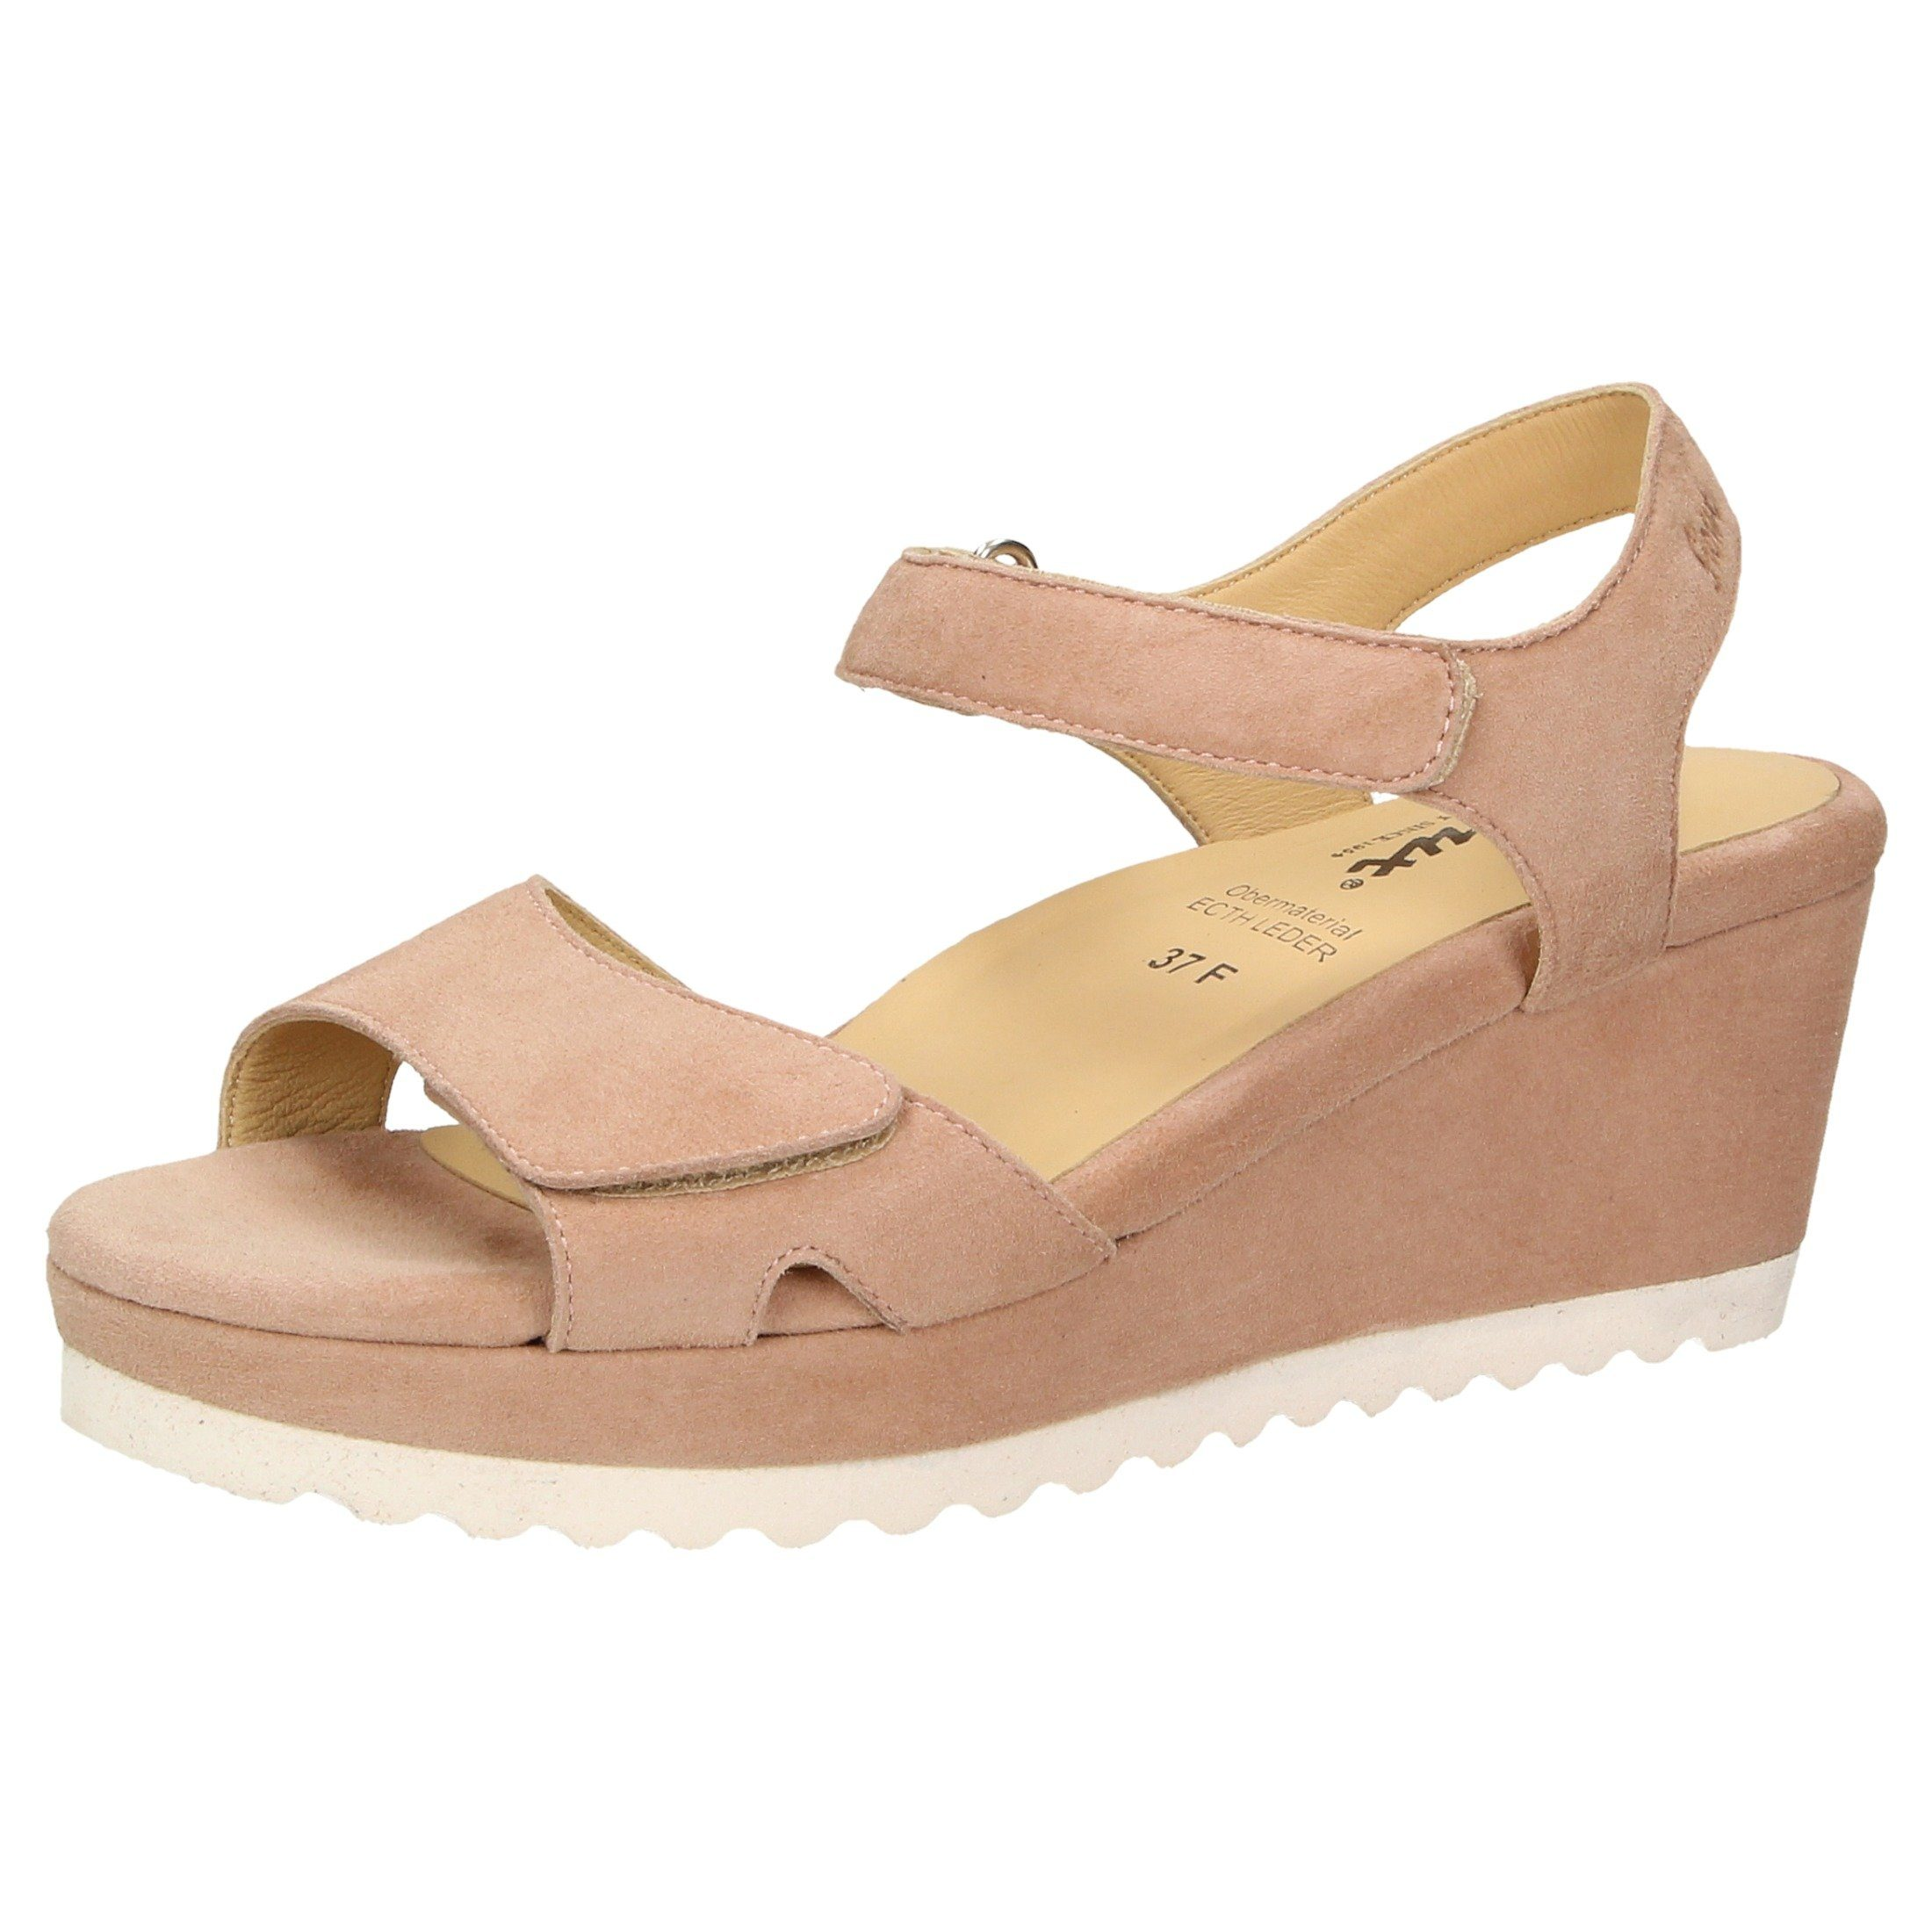 SIOUX Folinera Sandalette online kaufen  rosa